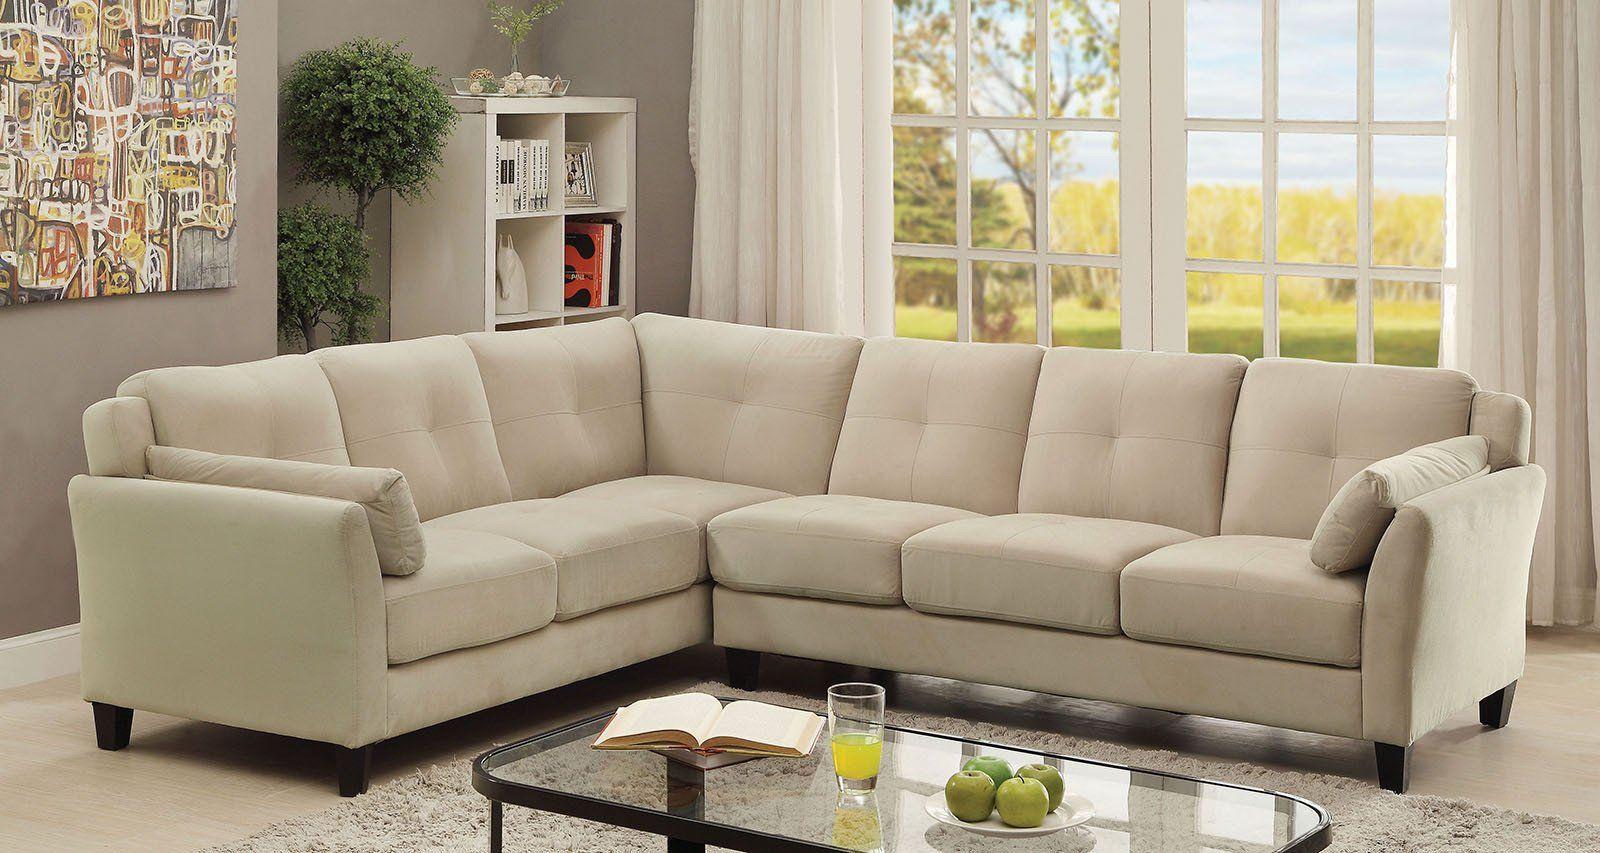 Peever ii sectional sofa cm6368bg